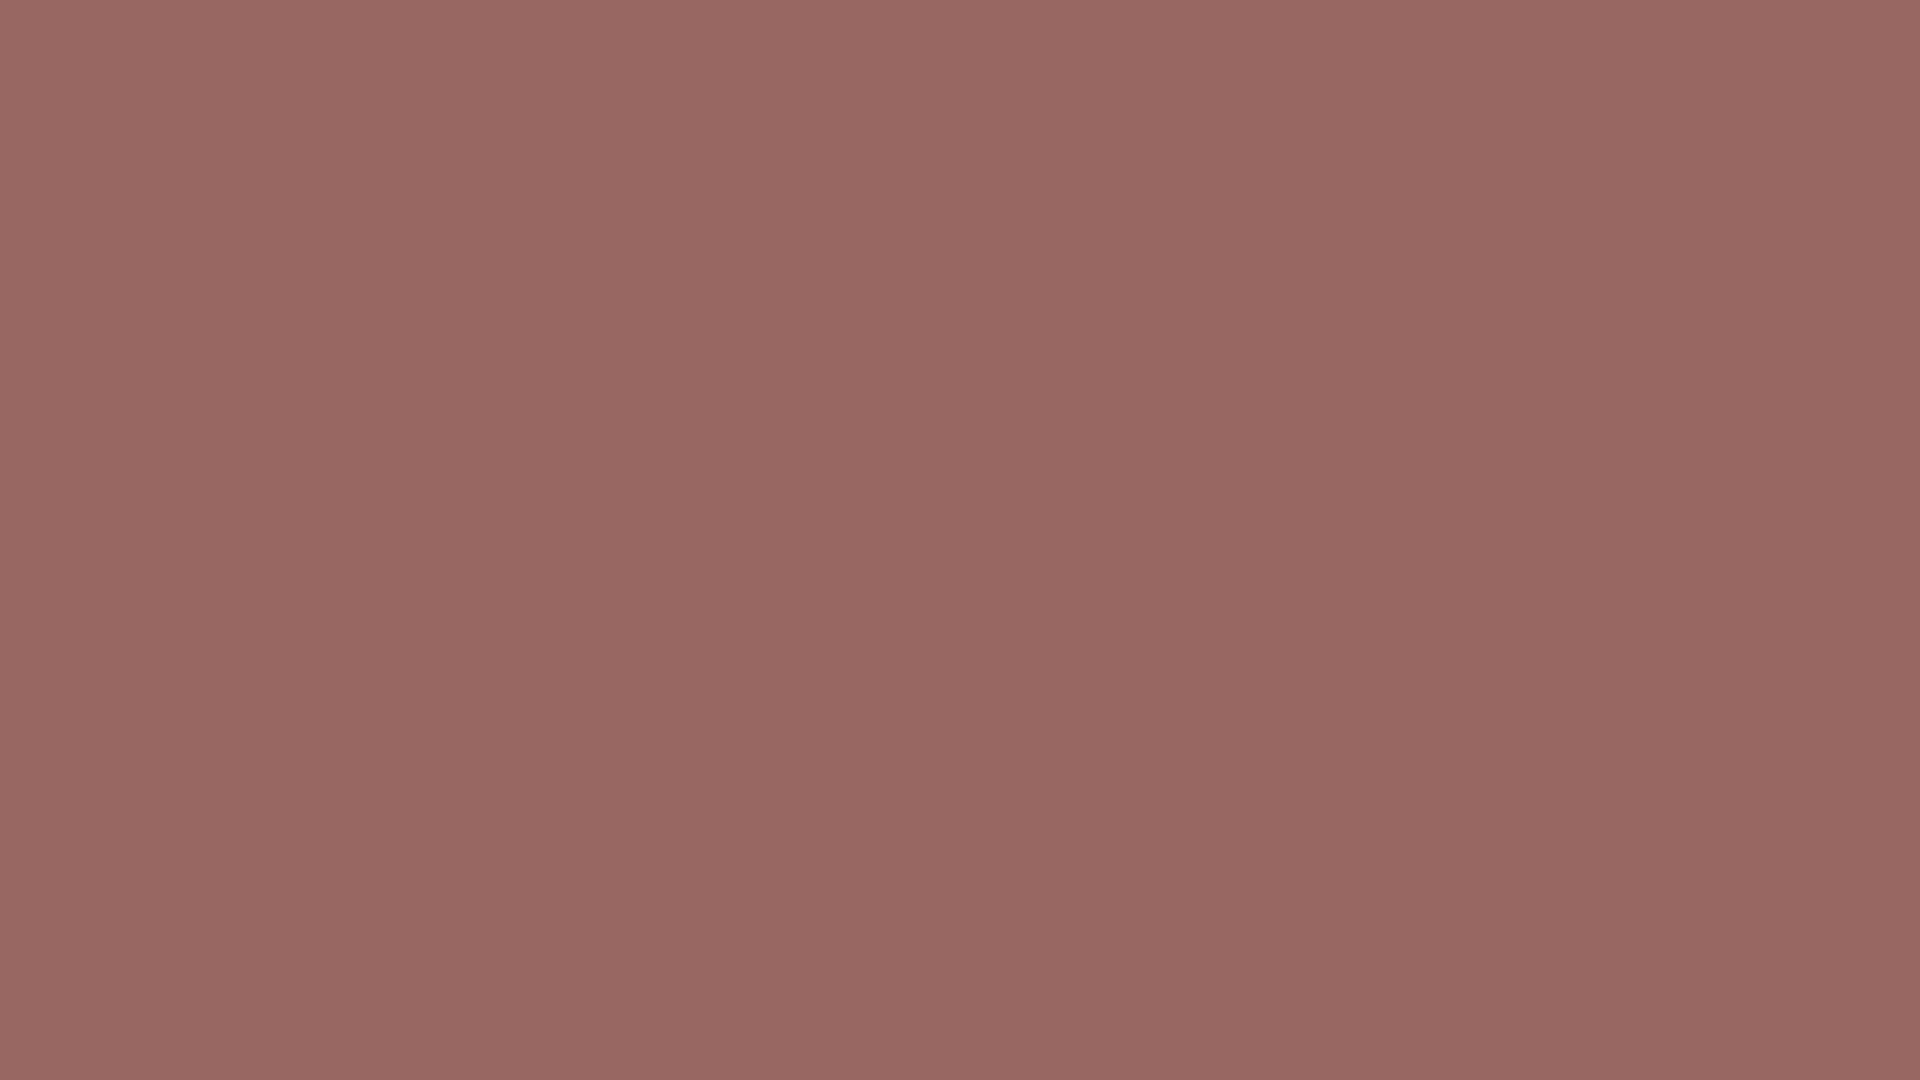 1920x1080 Dark Chestnut Solid Color Background